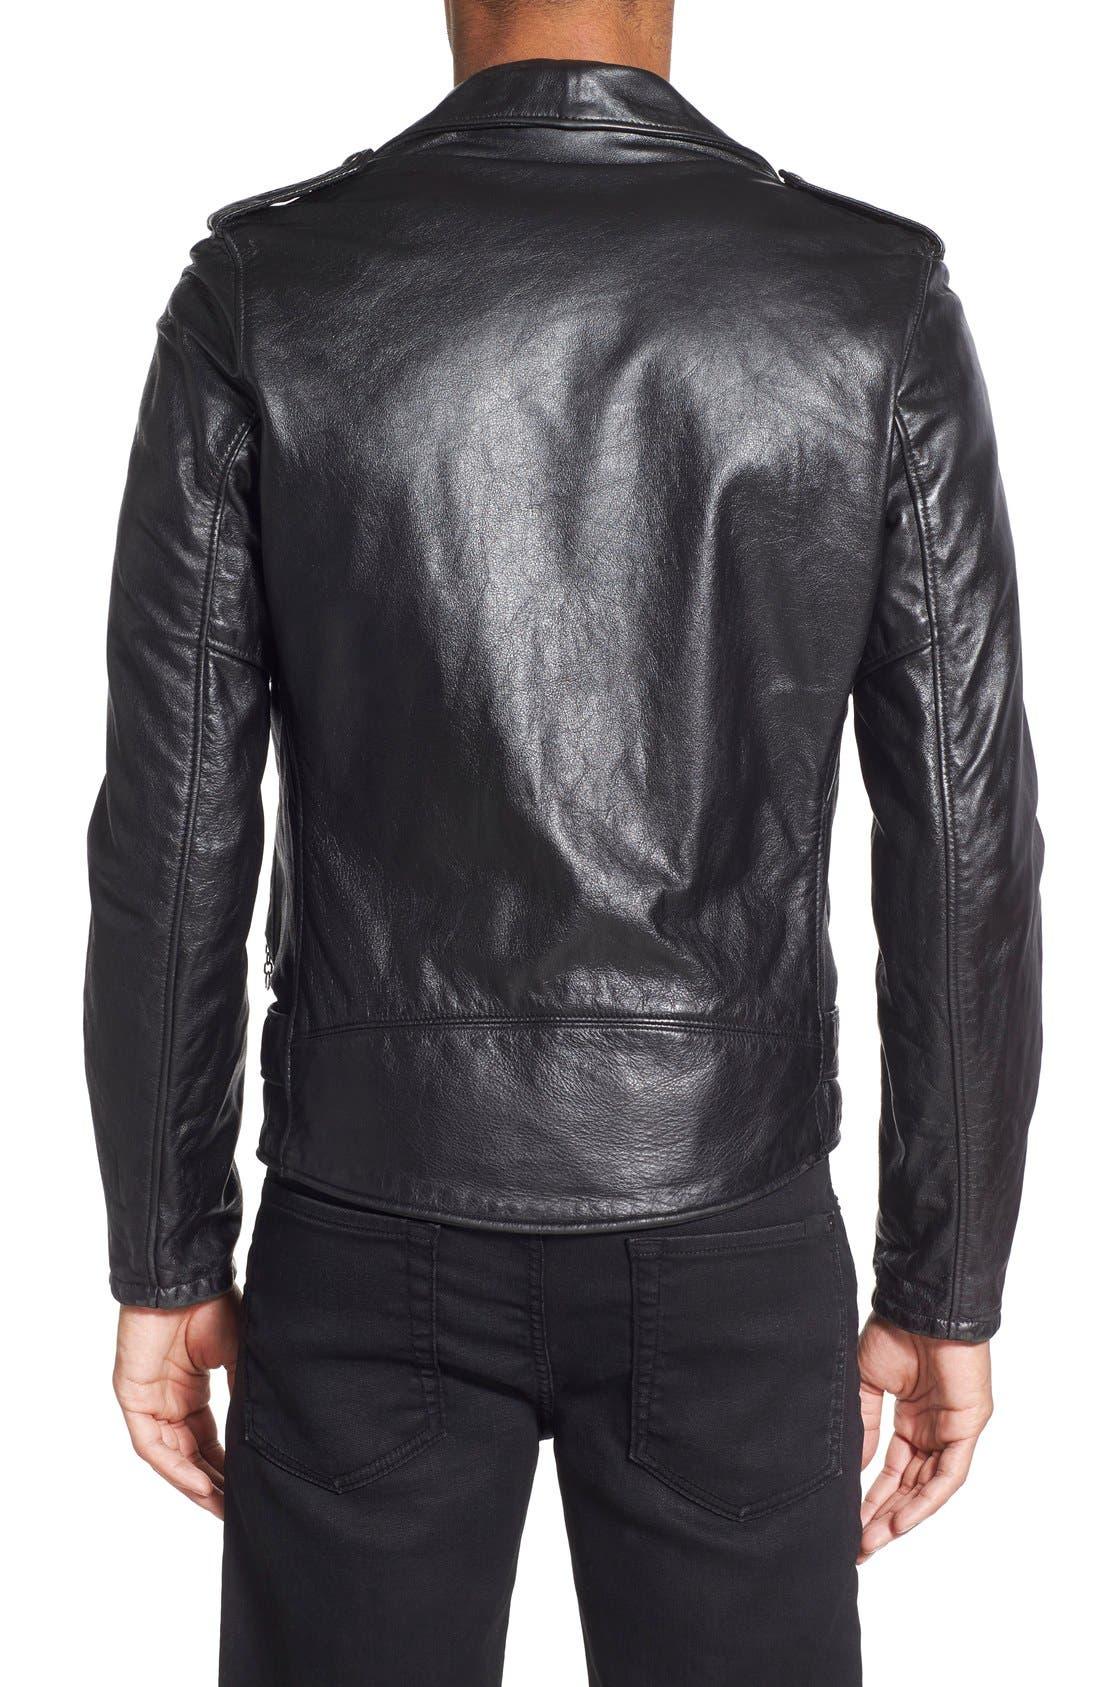 Hand Vintaged Cowhide Leather Motocycle Jacket,                             Alternate thumbnail 8, color,                             BLACK